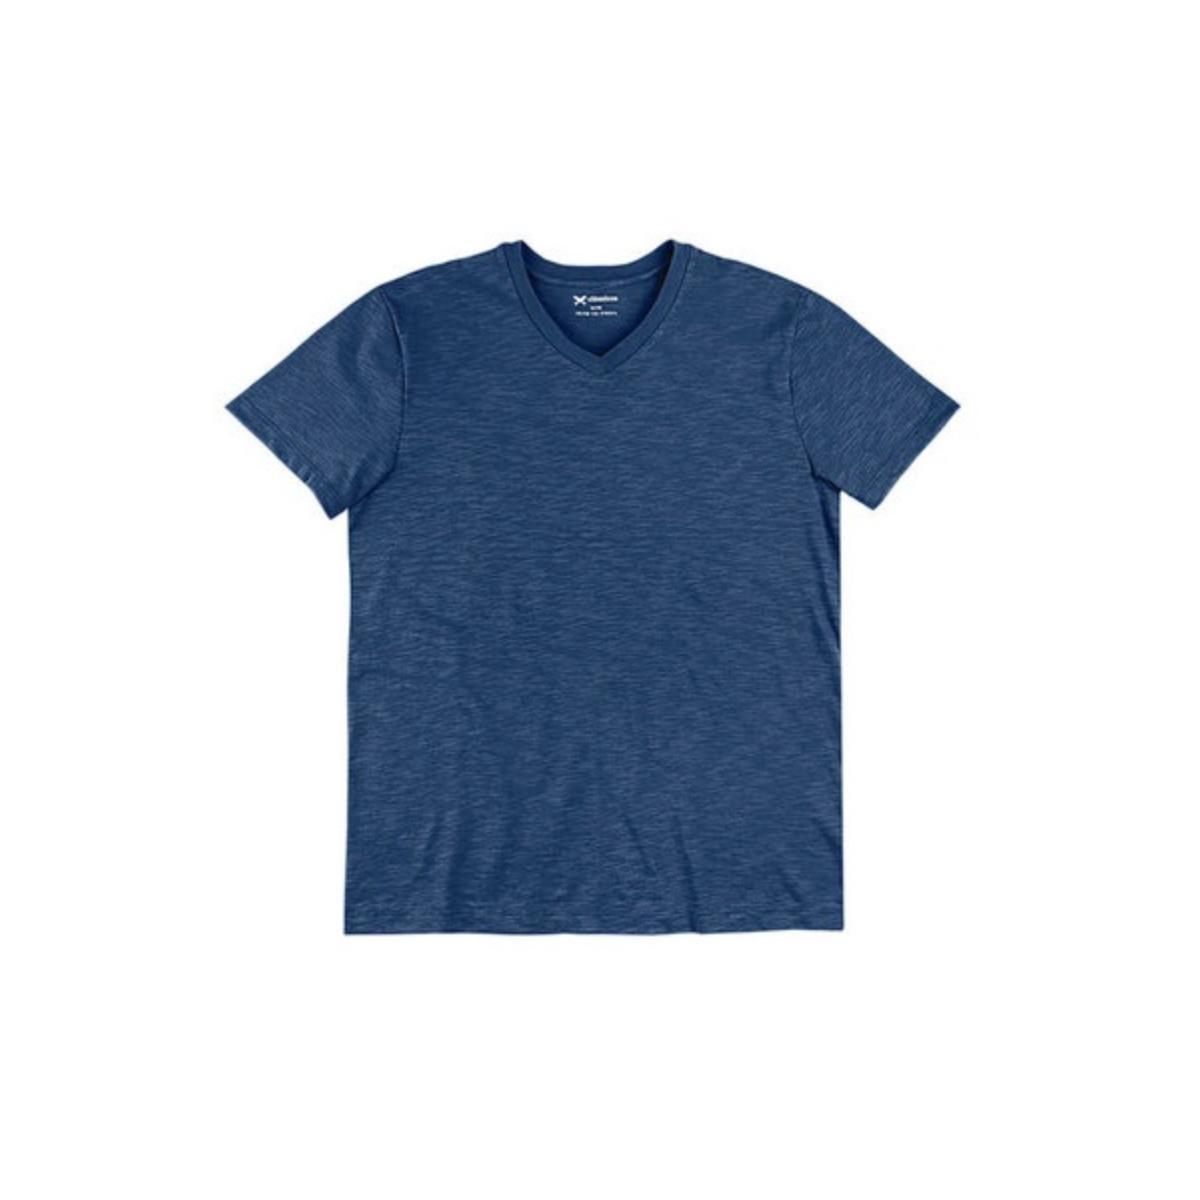 Camiseta Masculina Hering N2k5 A2yen Azul